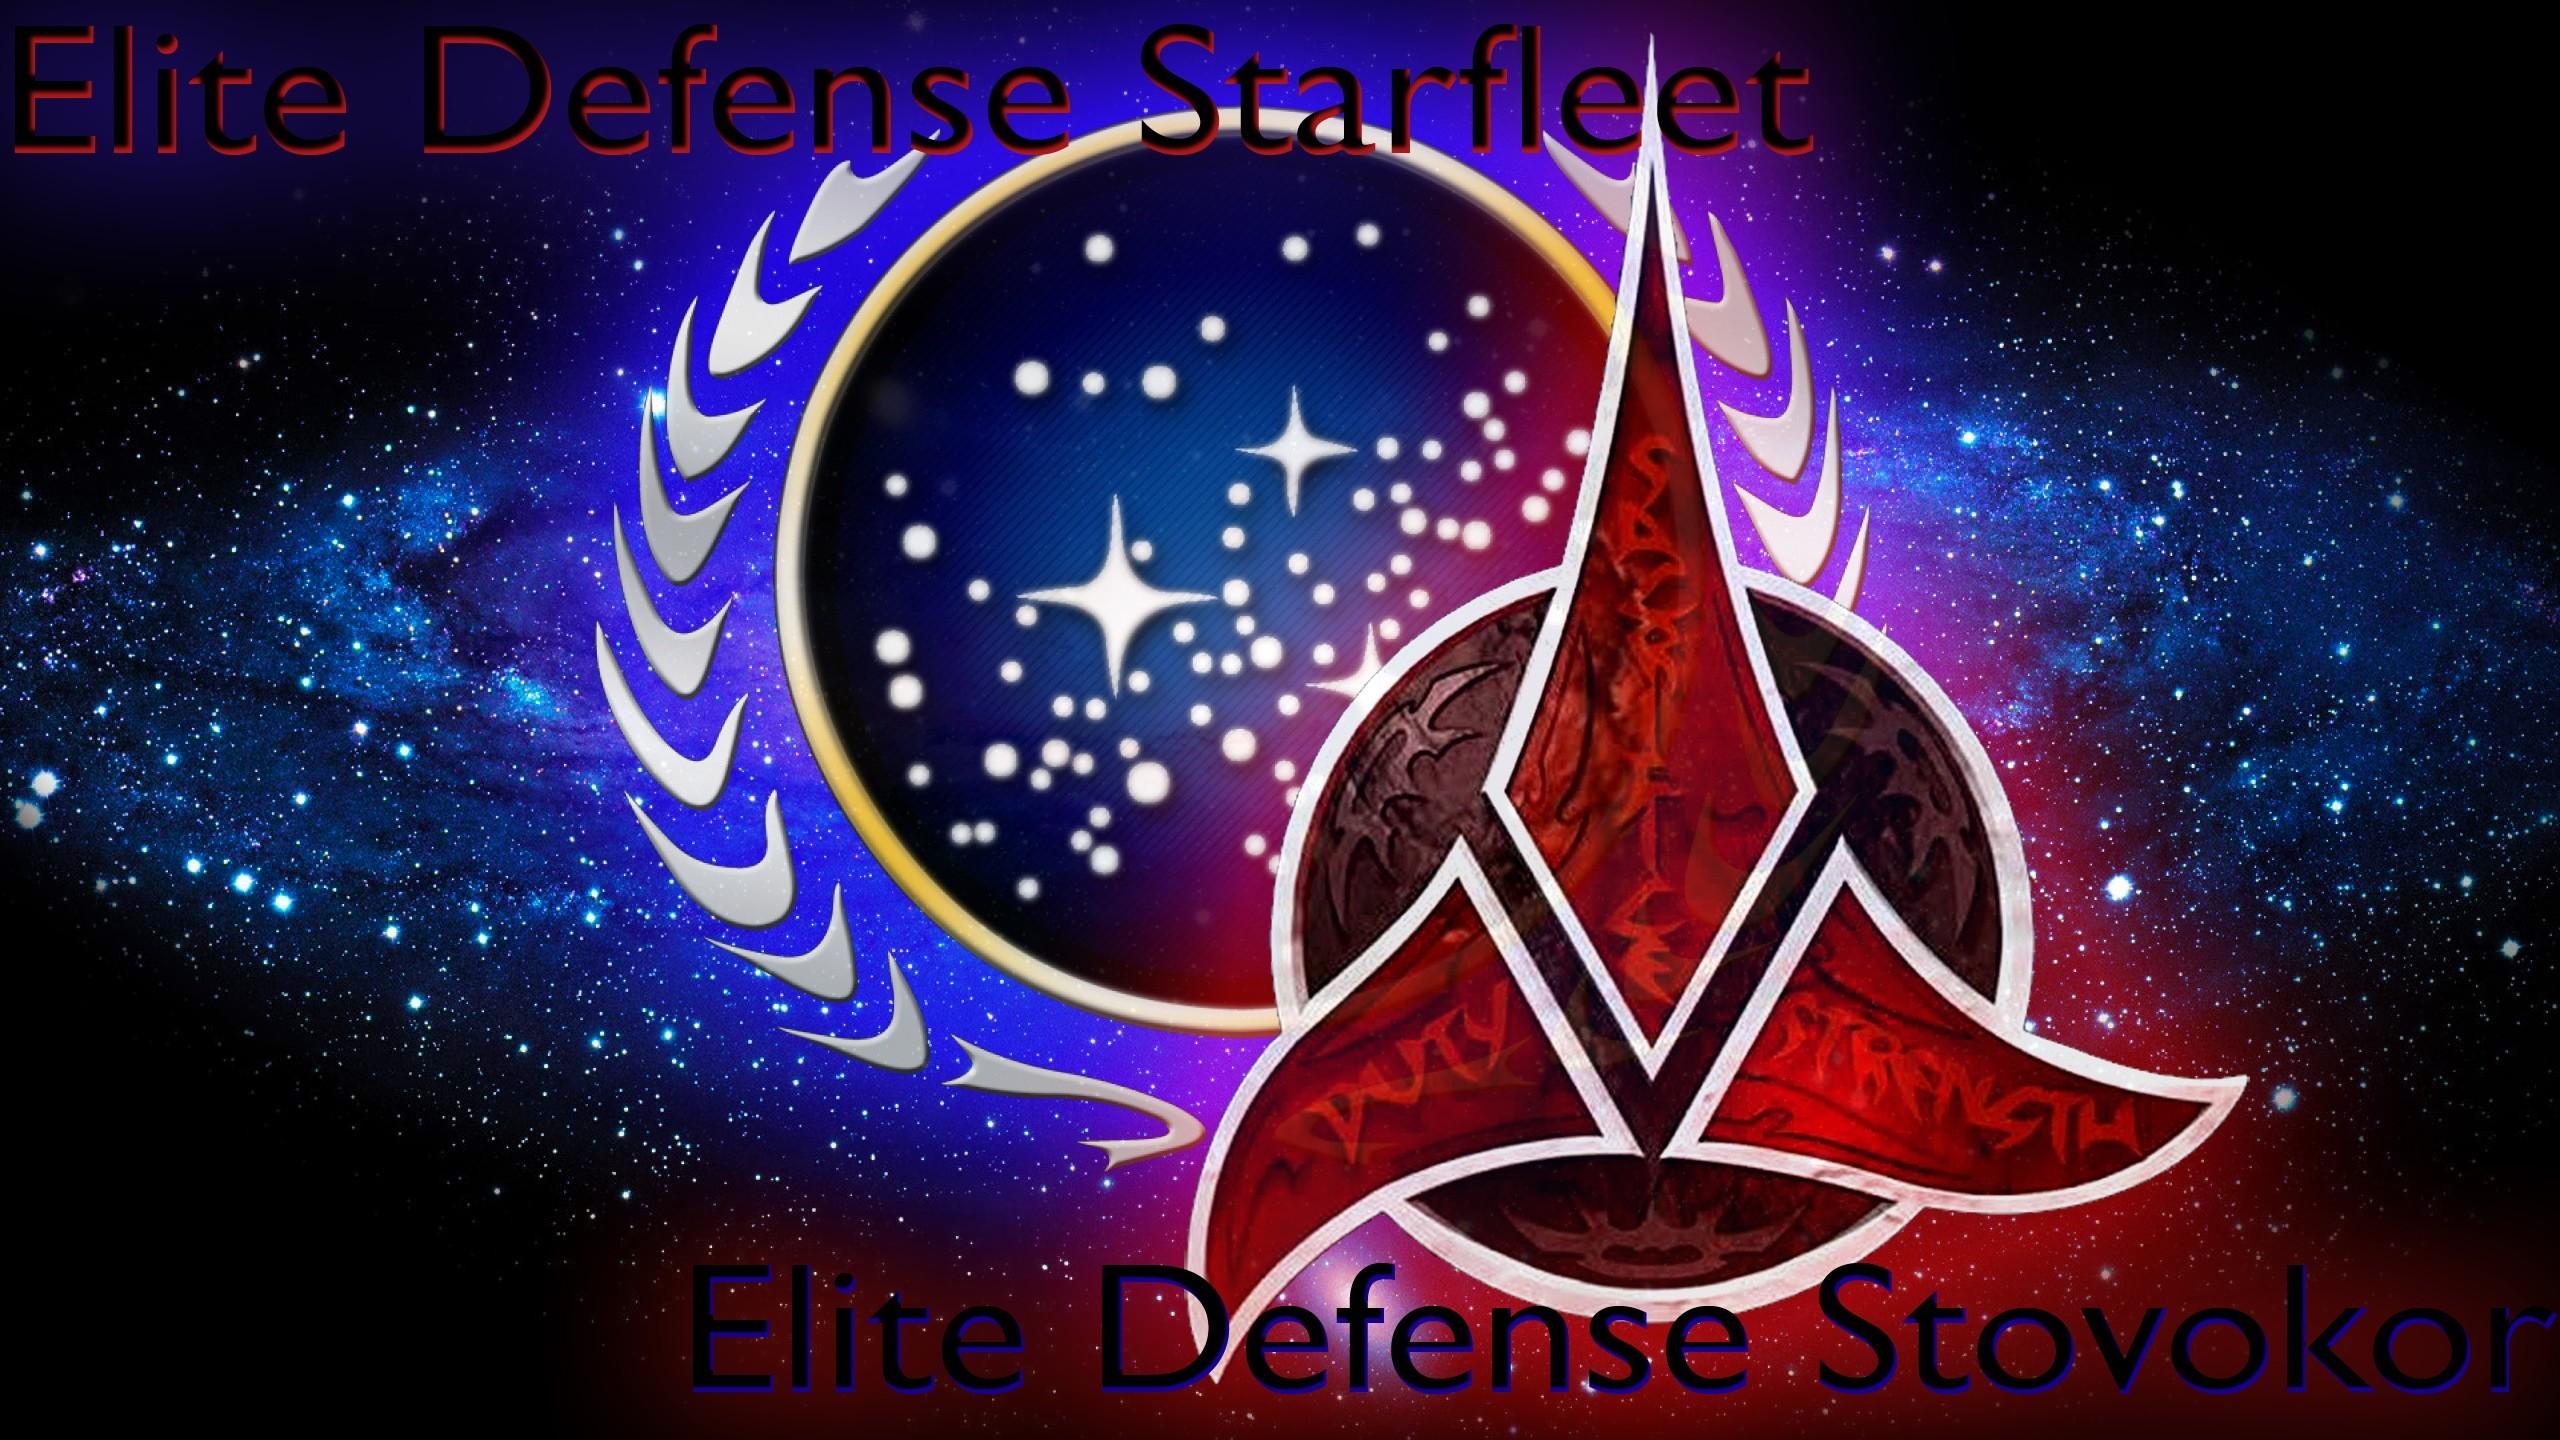 Elite Defense Starfleet